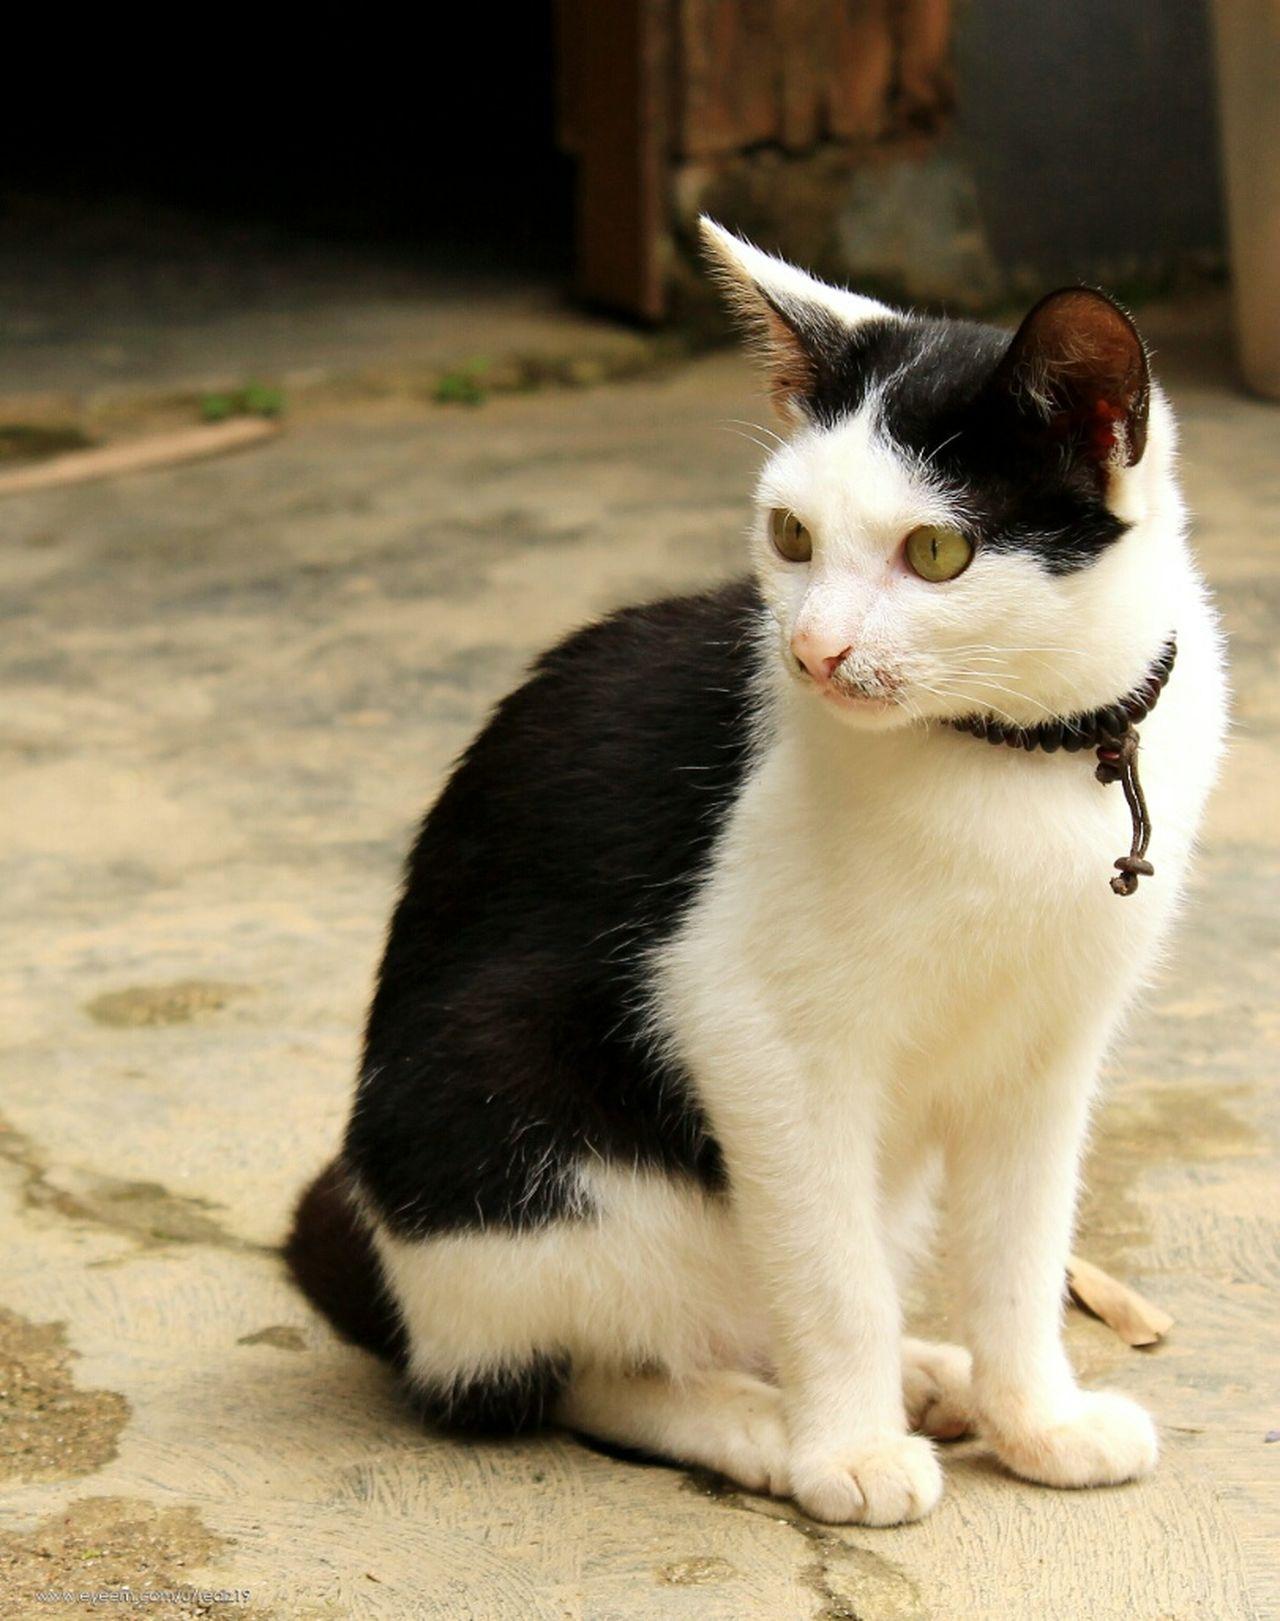 Cat One Animal Animal Themes Mammal Pets Domestic Animals Sitting Domestic Cat Feline Day Toraja Kete Kesu Rantepao Toraja Utara INDONESIA